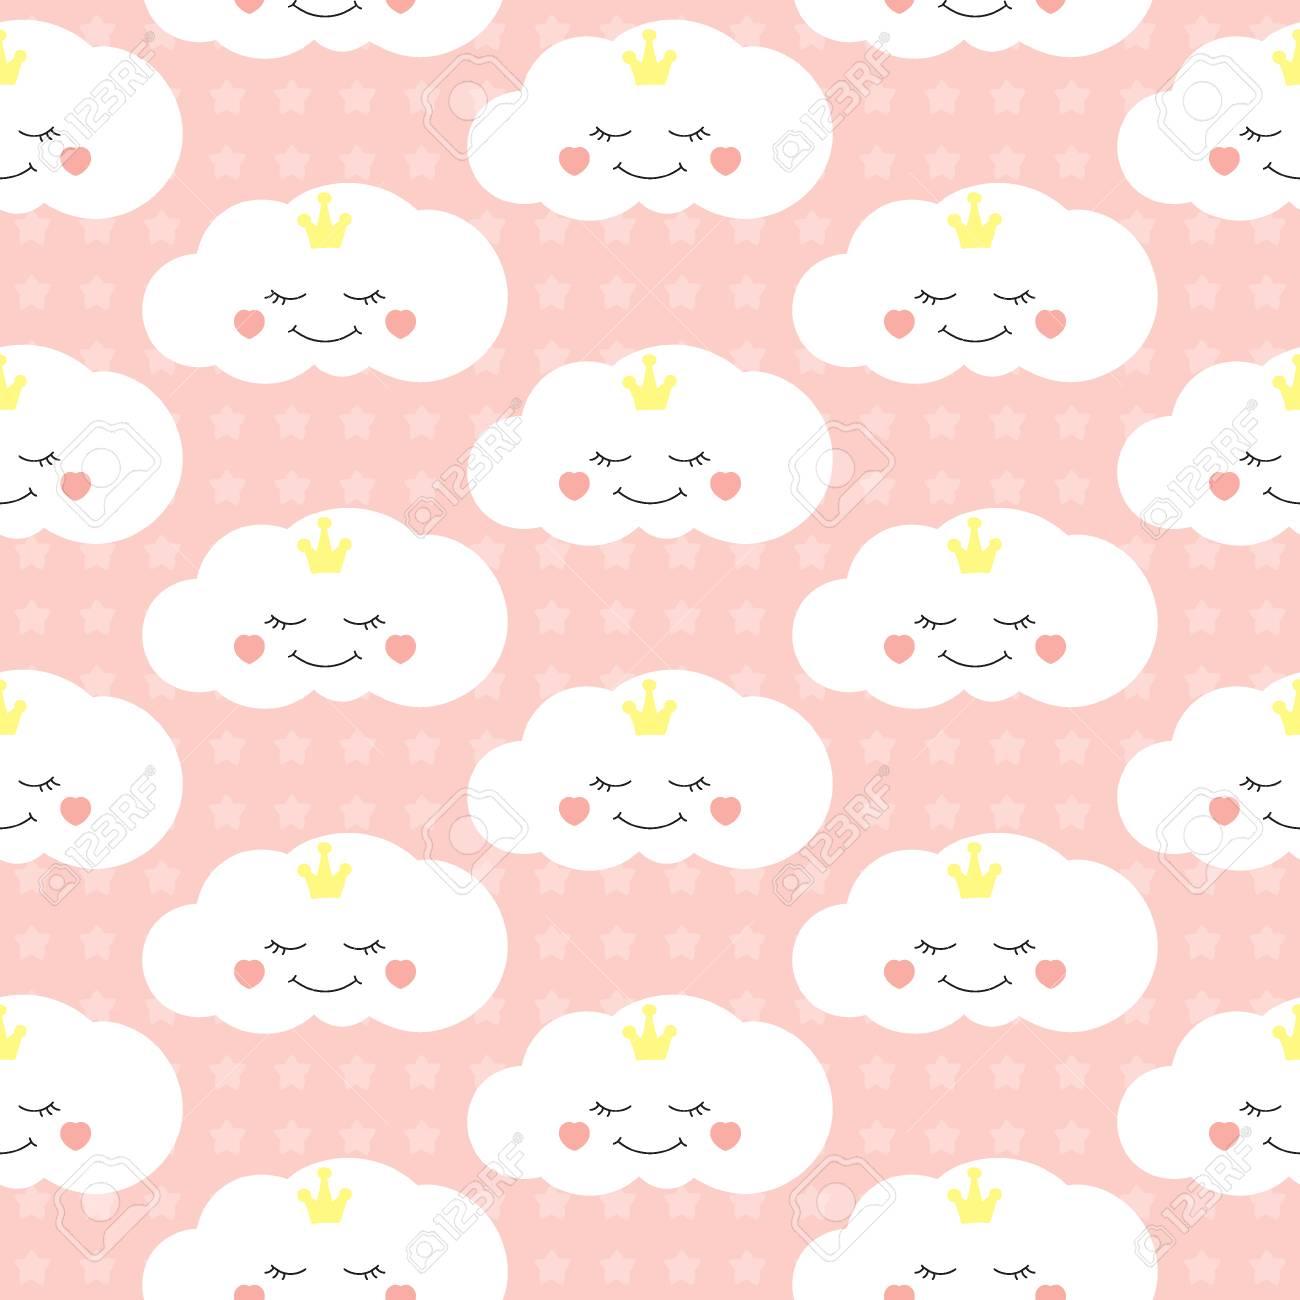 Cute baby cloud pattern vector seamless  Little princess print